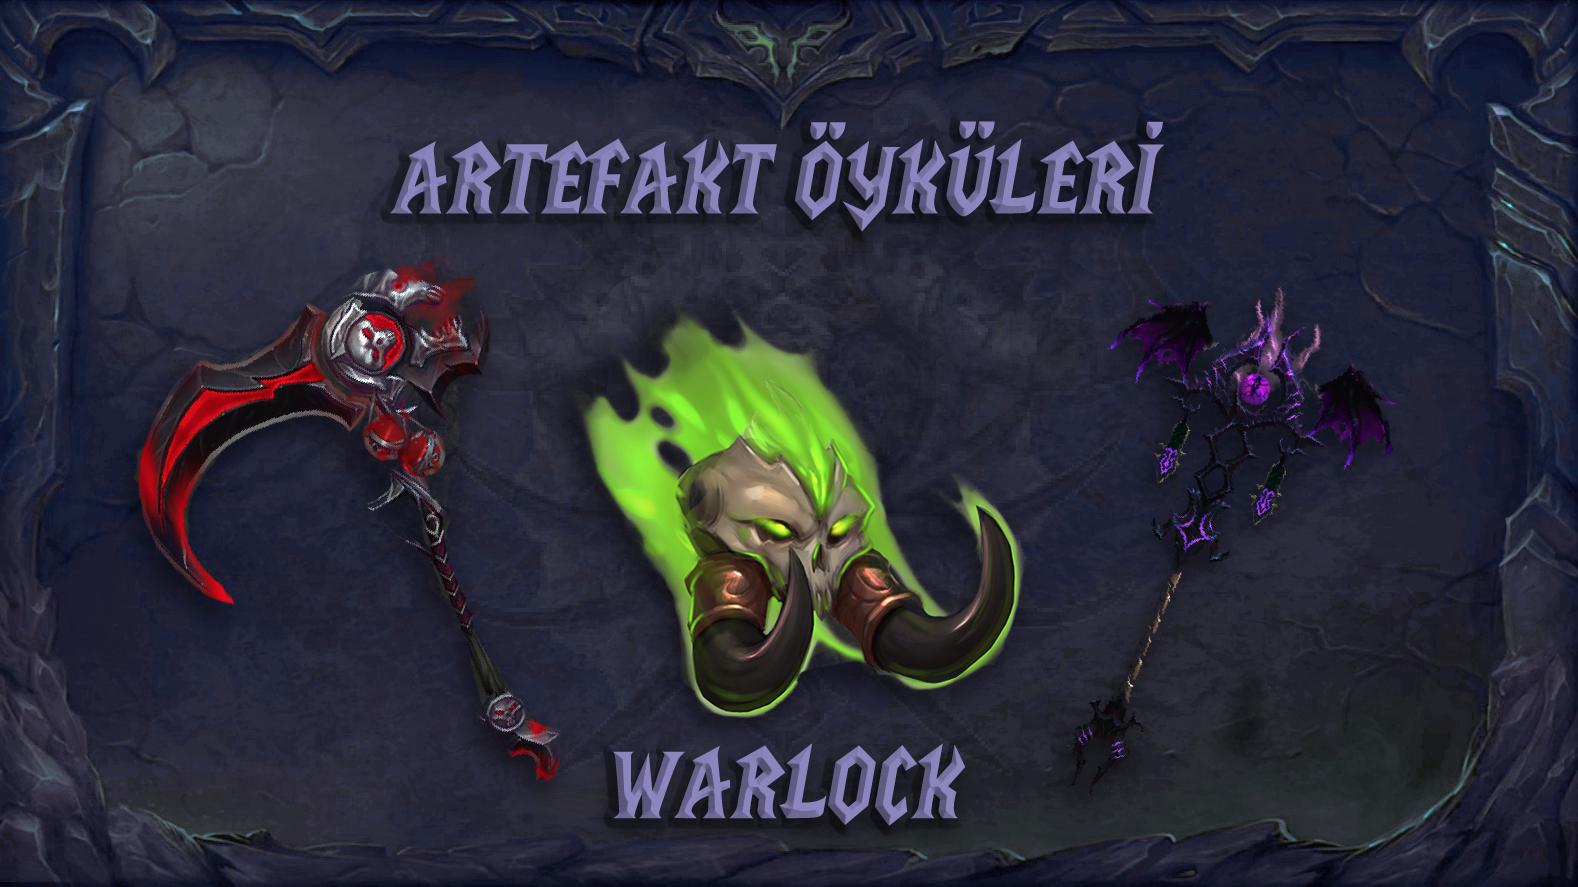 lorekeeper-artefakt-oykuleri-warlock